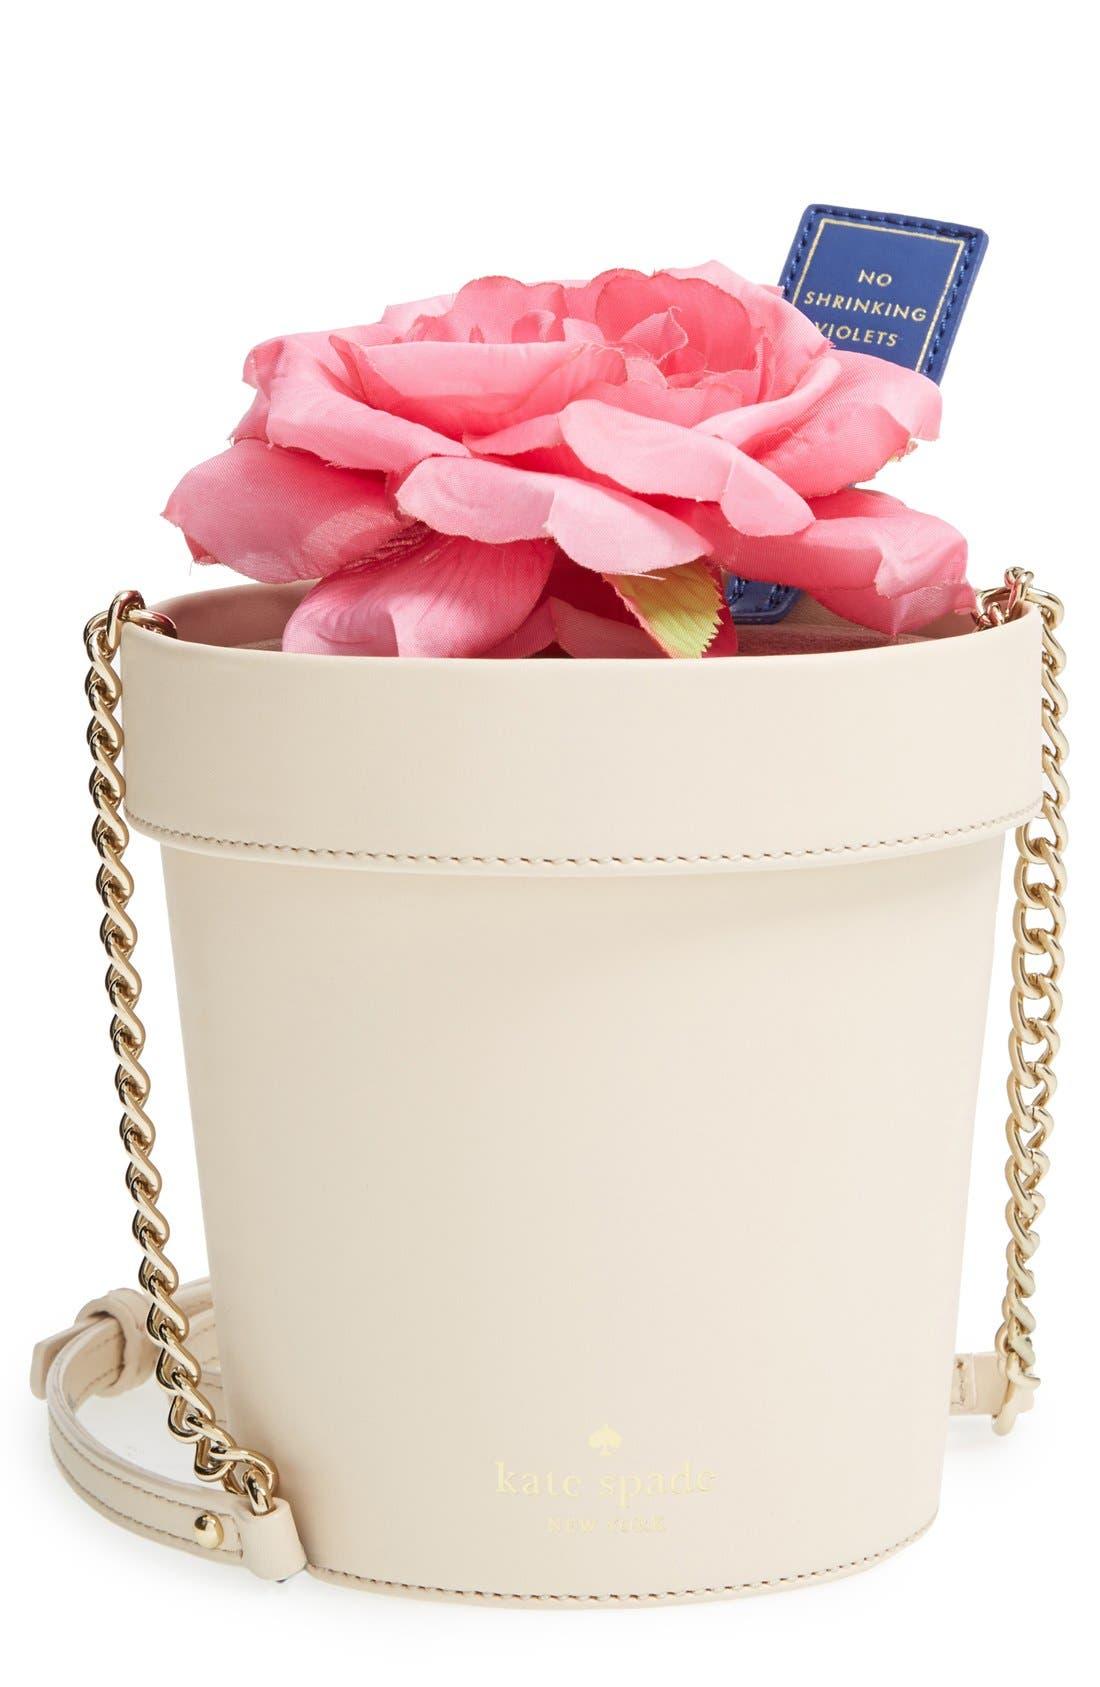 KATE SPADE NEW YORK, 'spring forward - flowerpot' crossbody bag, Main thumbnail 1, color, 100